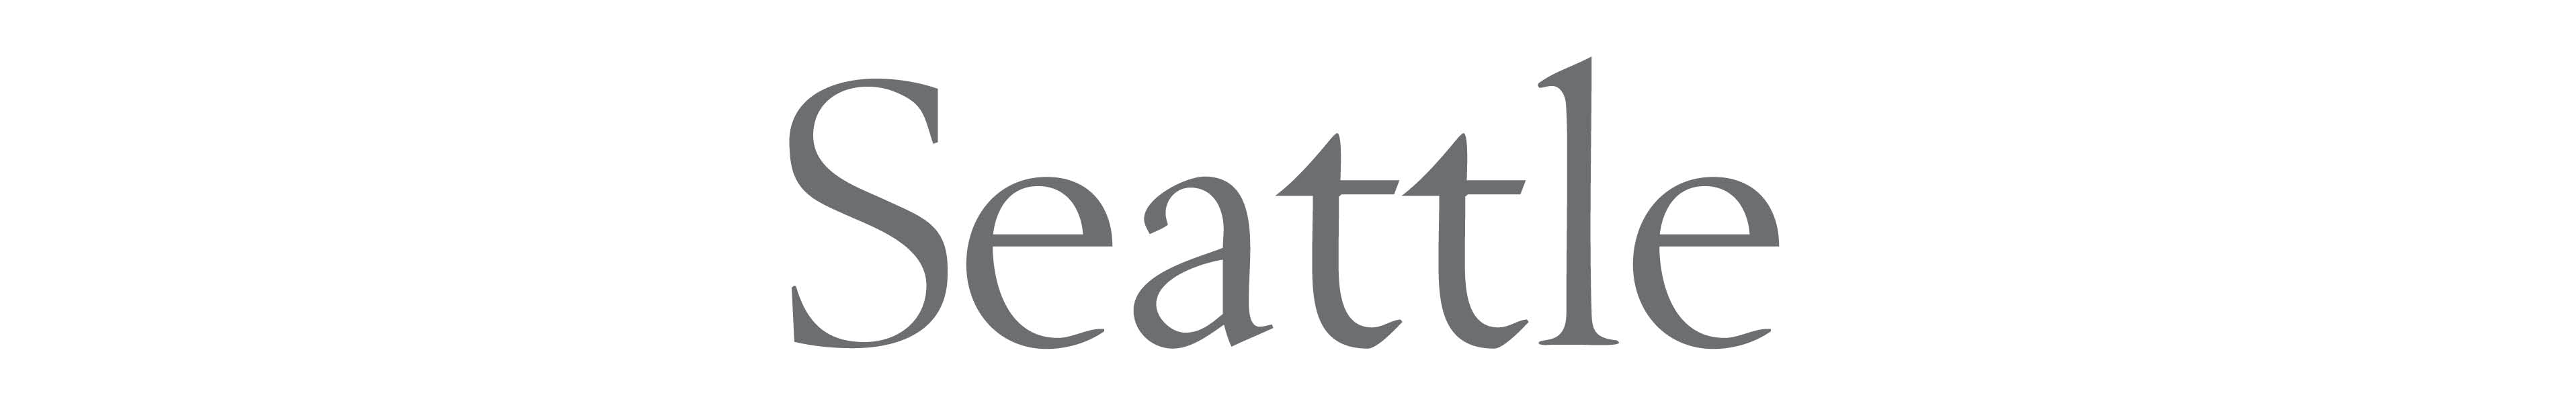 Seattle Design Trade